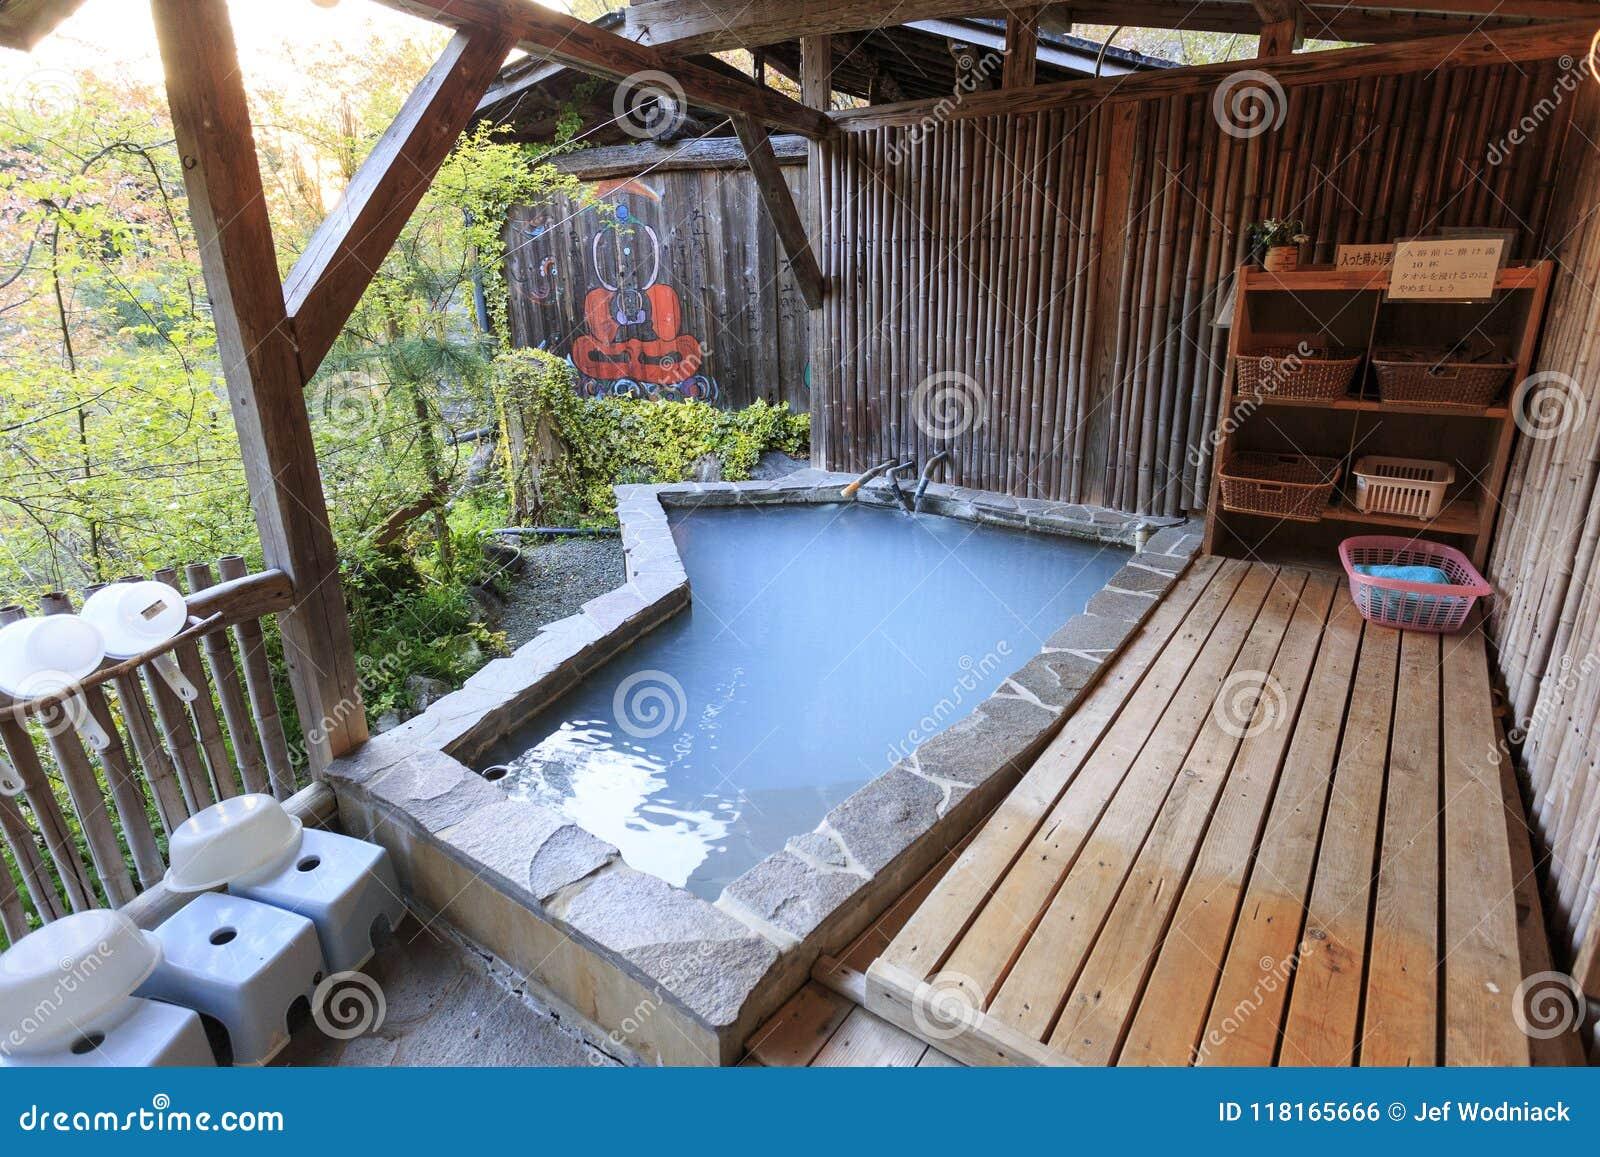 Traditional Japanese Bath In Yamagawan. Stock Photo - Image of ...